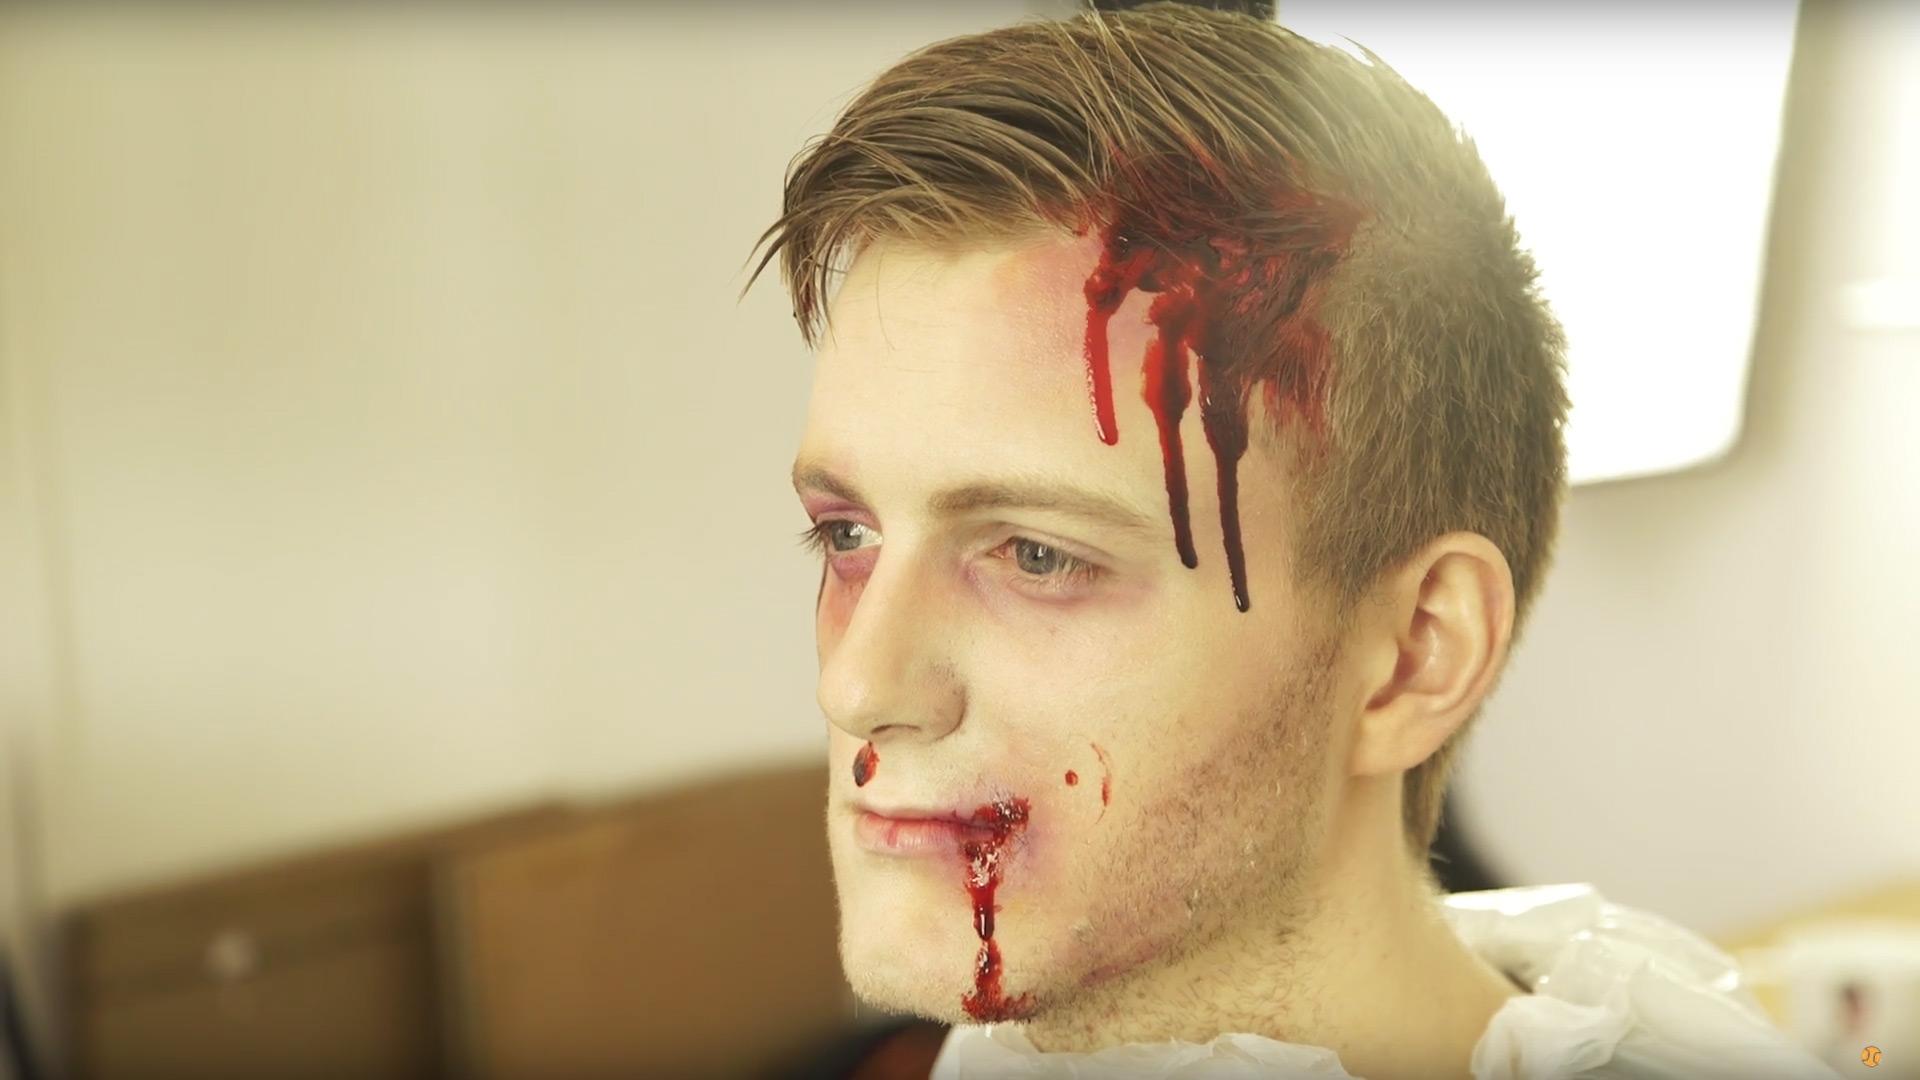 Get-the-Bloody-&-Beaten-Look.jpg